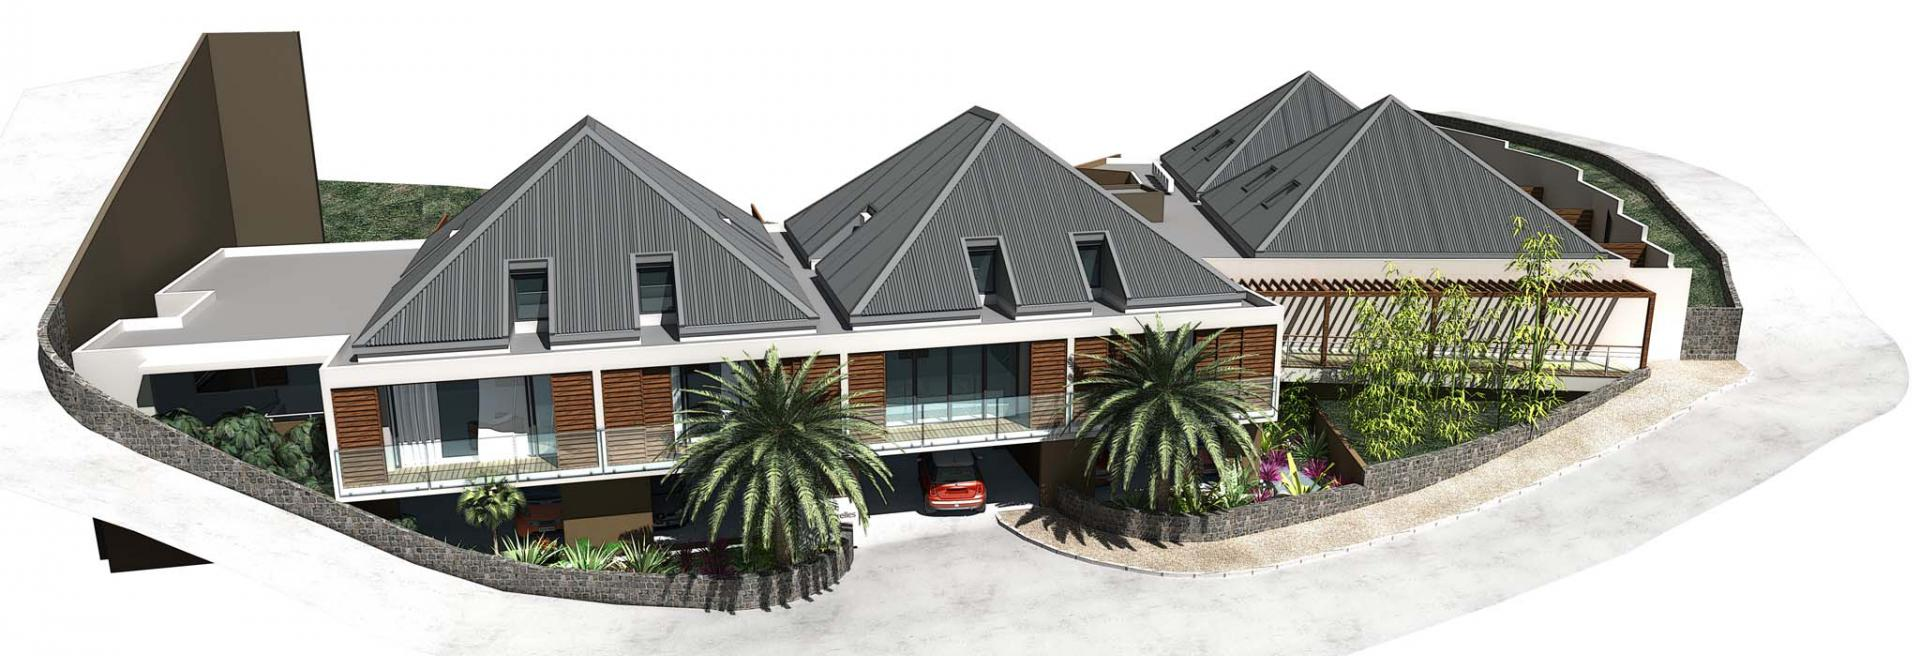 Résidence le Rocher Vert | Golden Coast Real Estate - Saint Barth ...